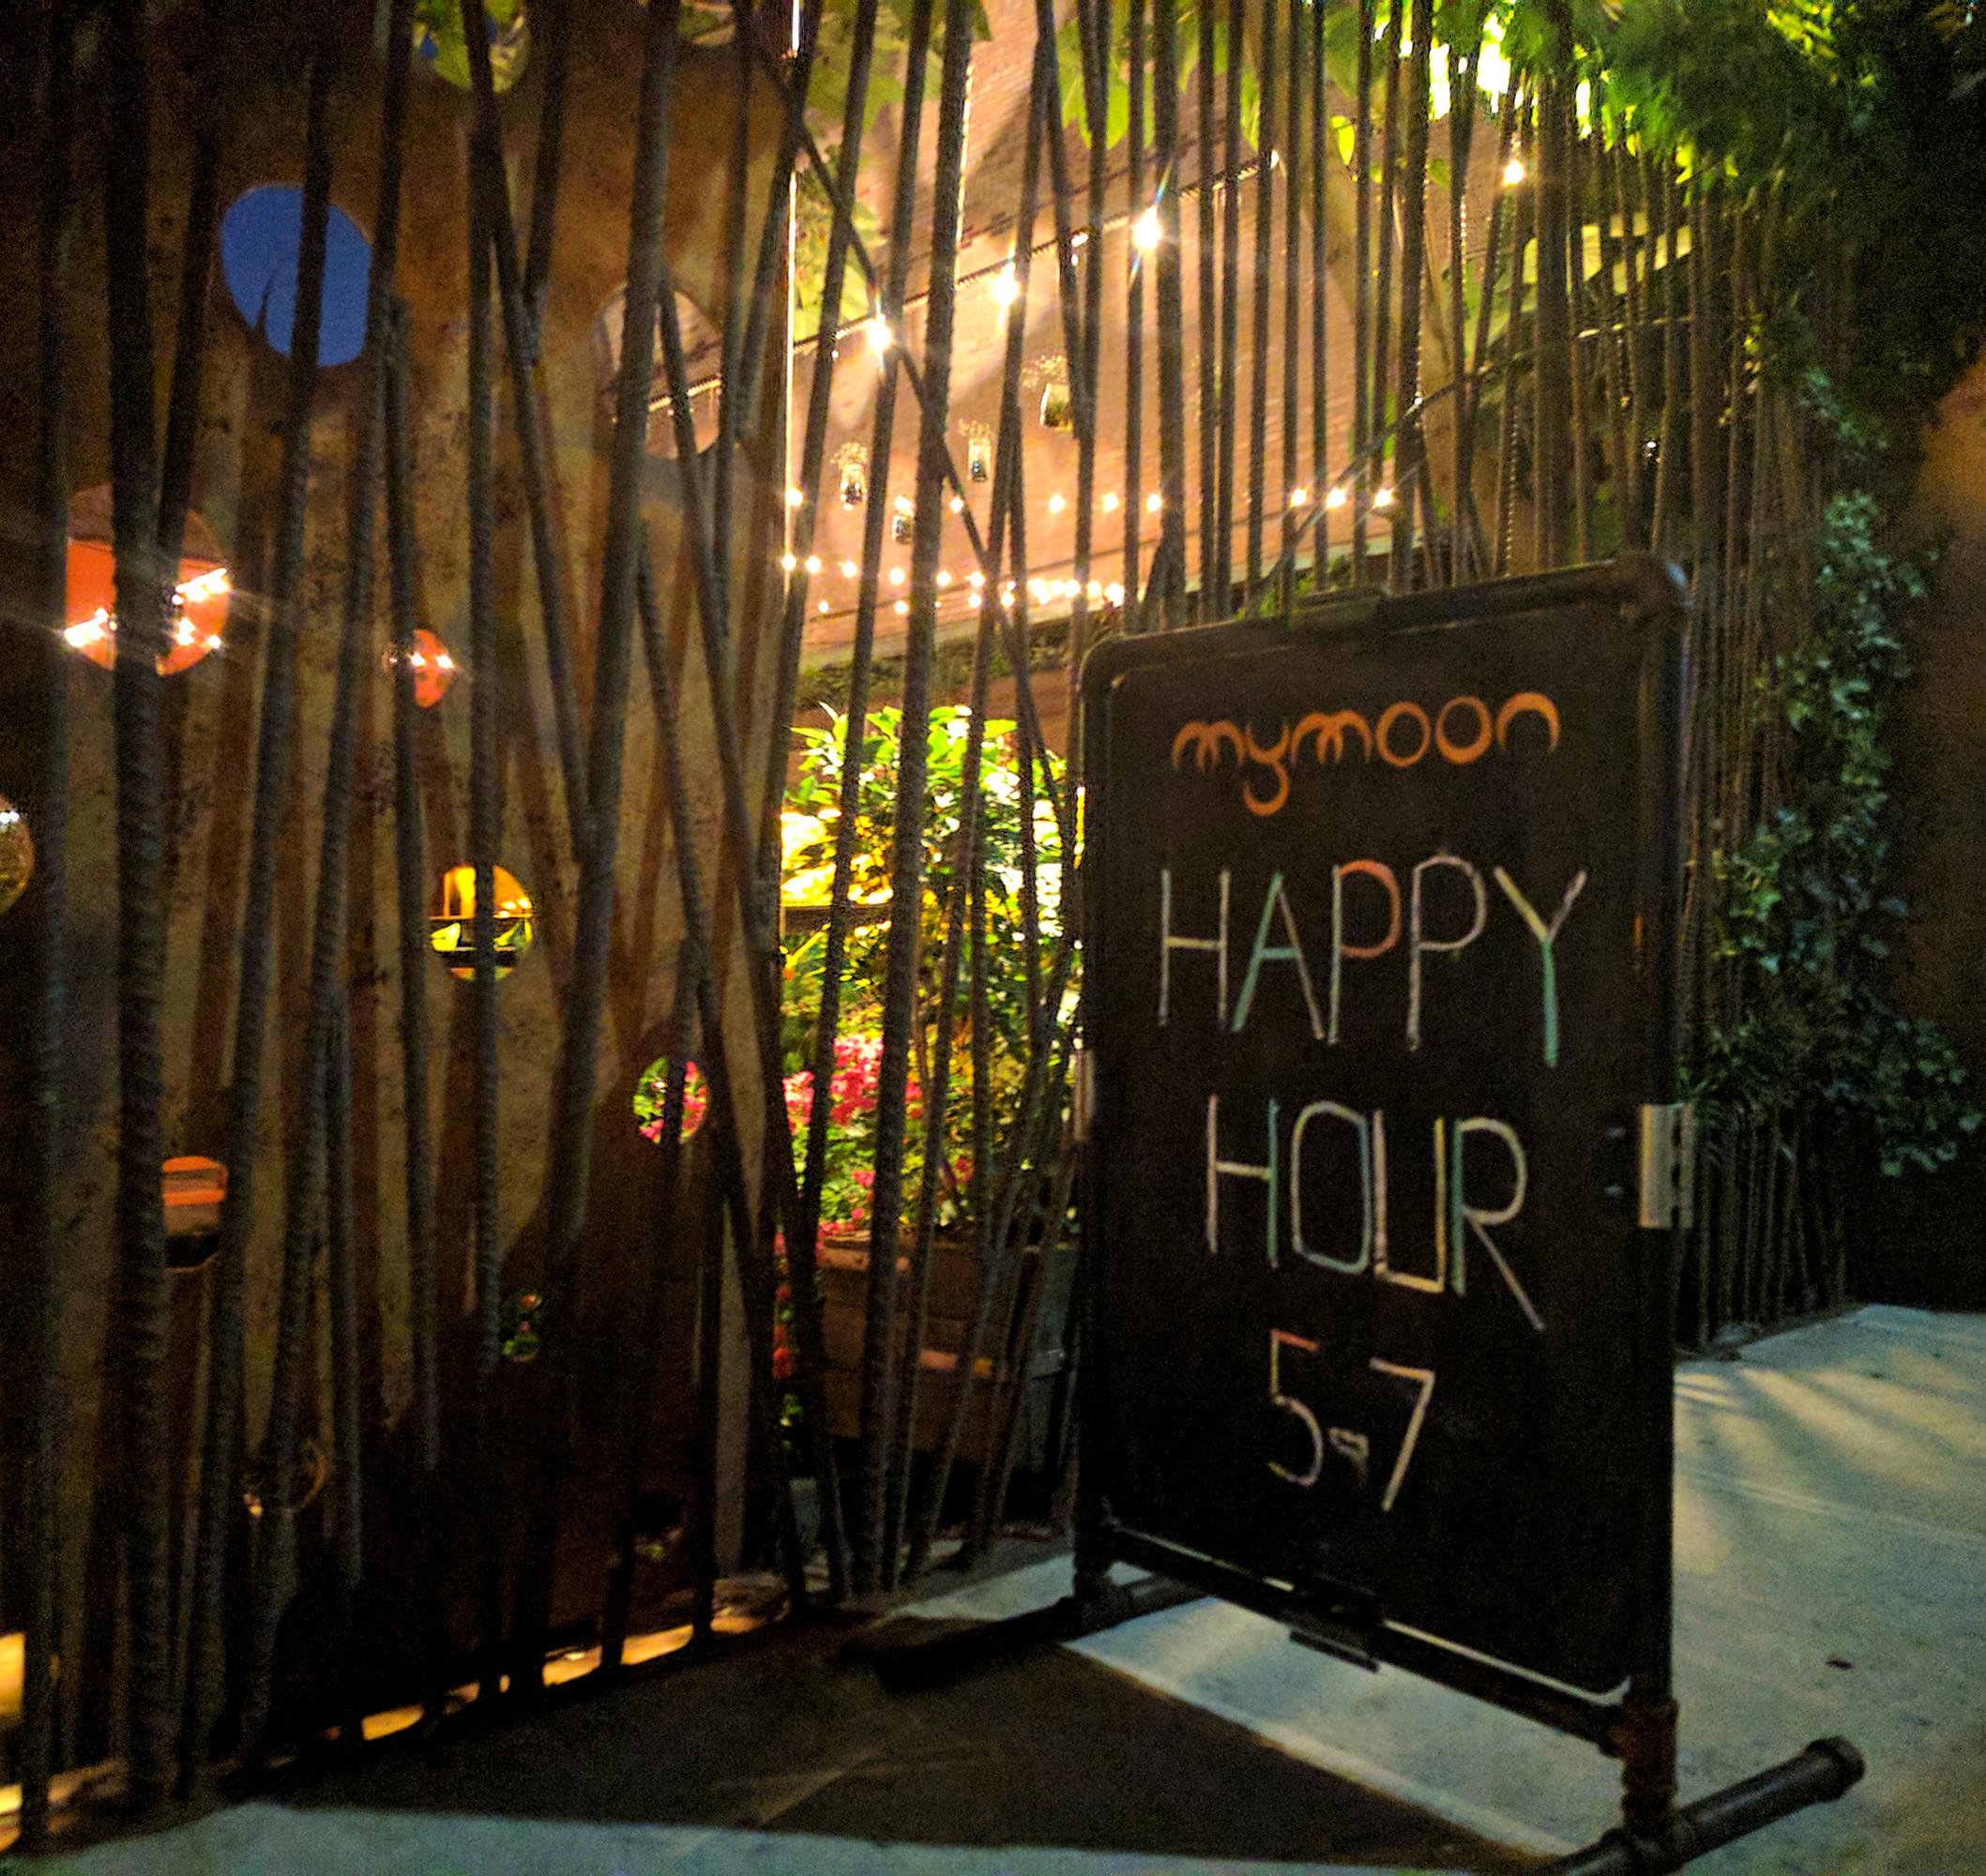 My Moon restaurant happy hour